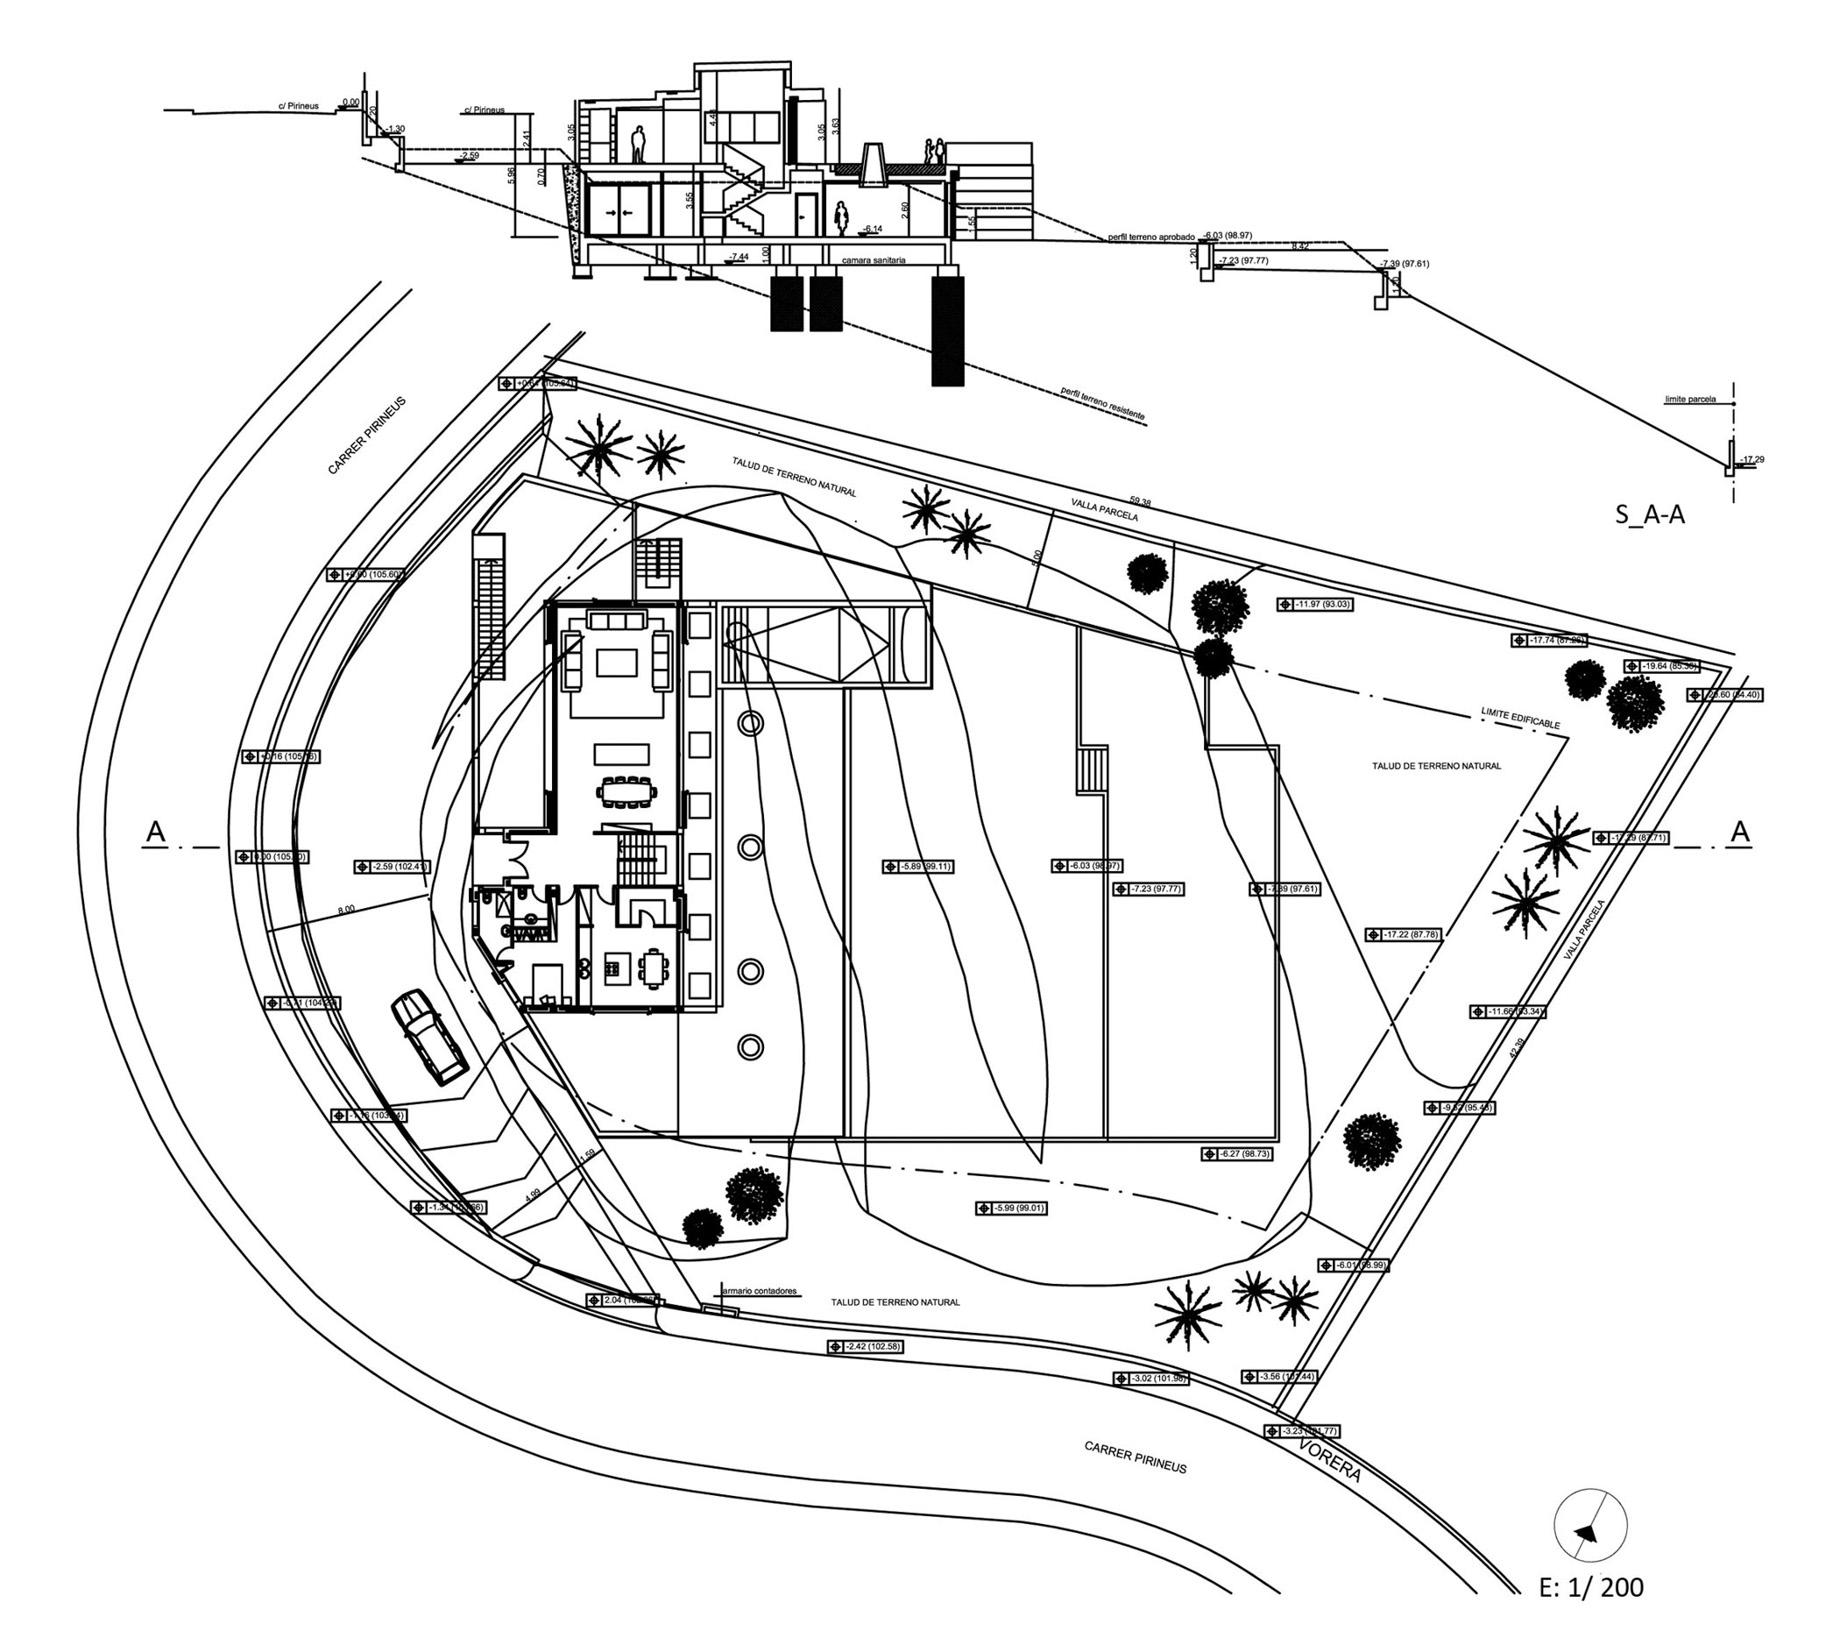 Site Plan - Santa Cristina d'Aro Residence - Girona, Catalonia, Spain